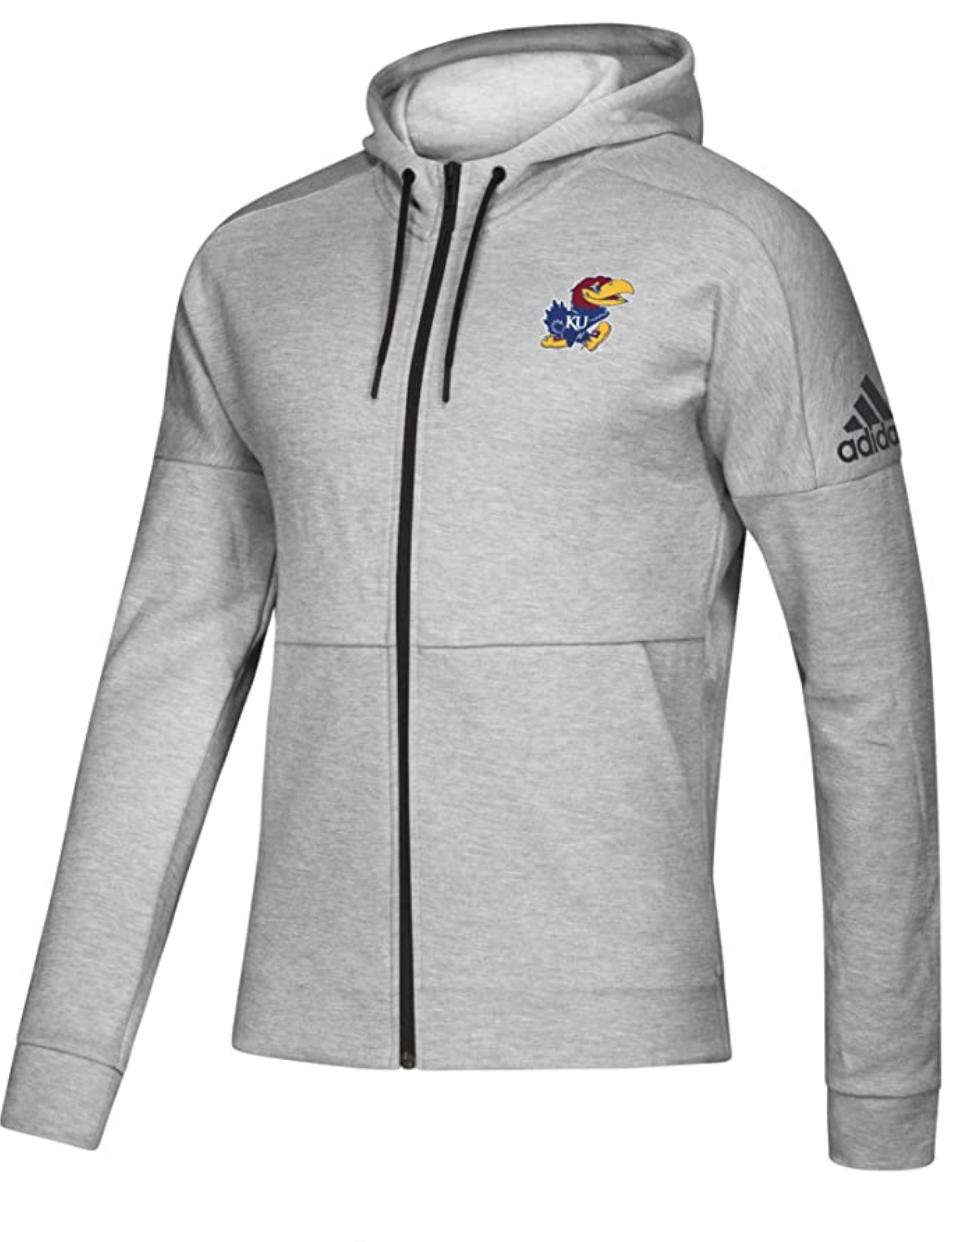 Men's adidas x NCAA Fleece Zip Up Kansas Jayhawks $19.17 & More + FS w/ Prime